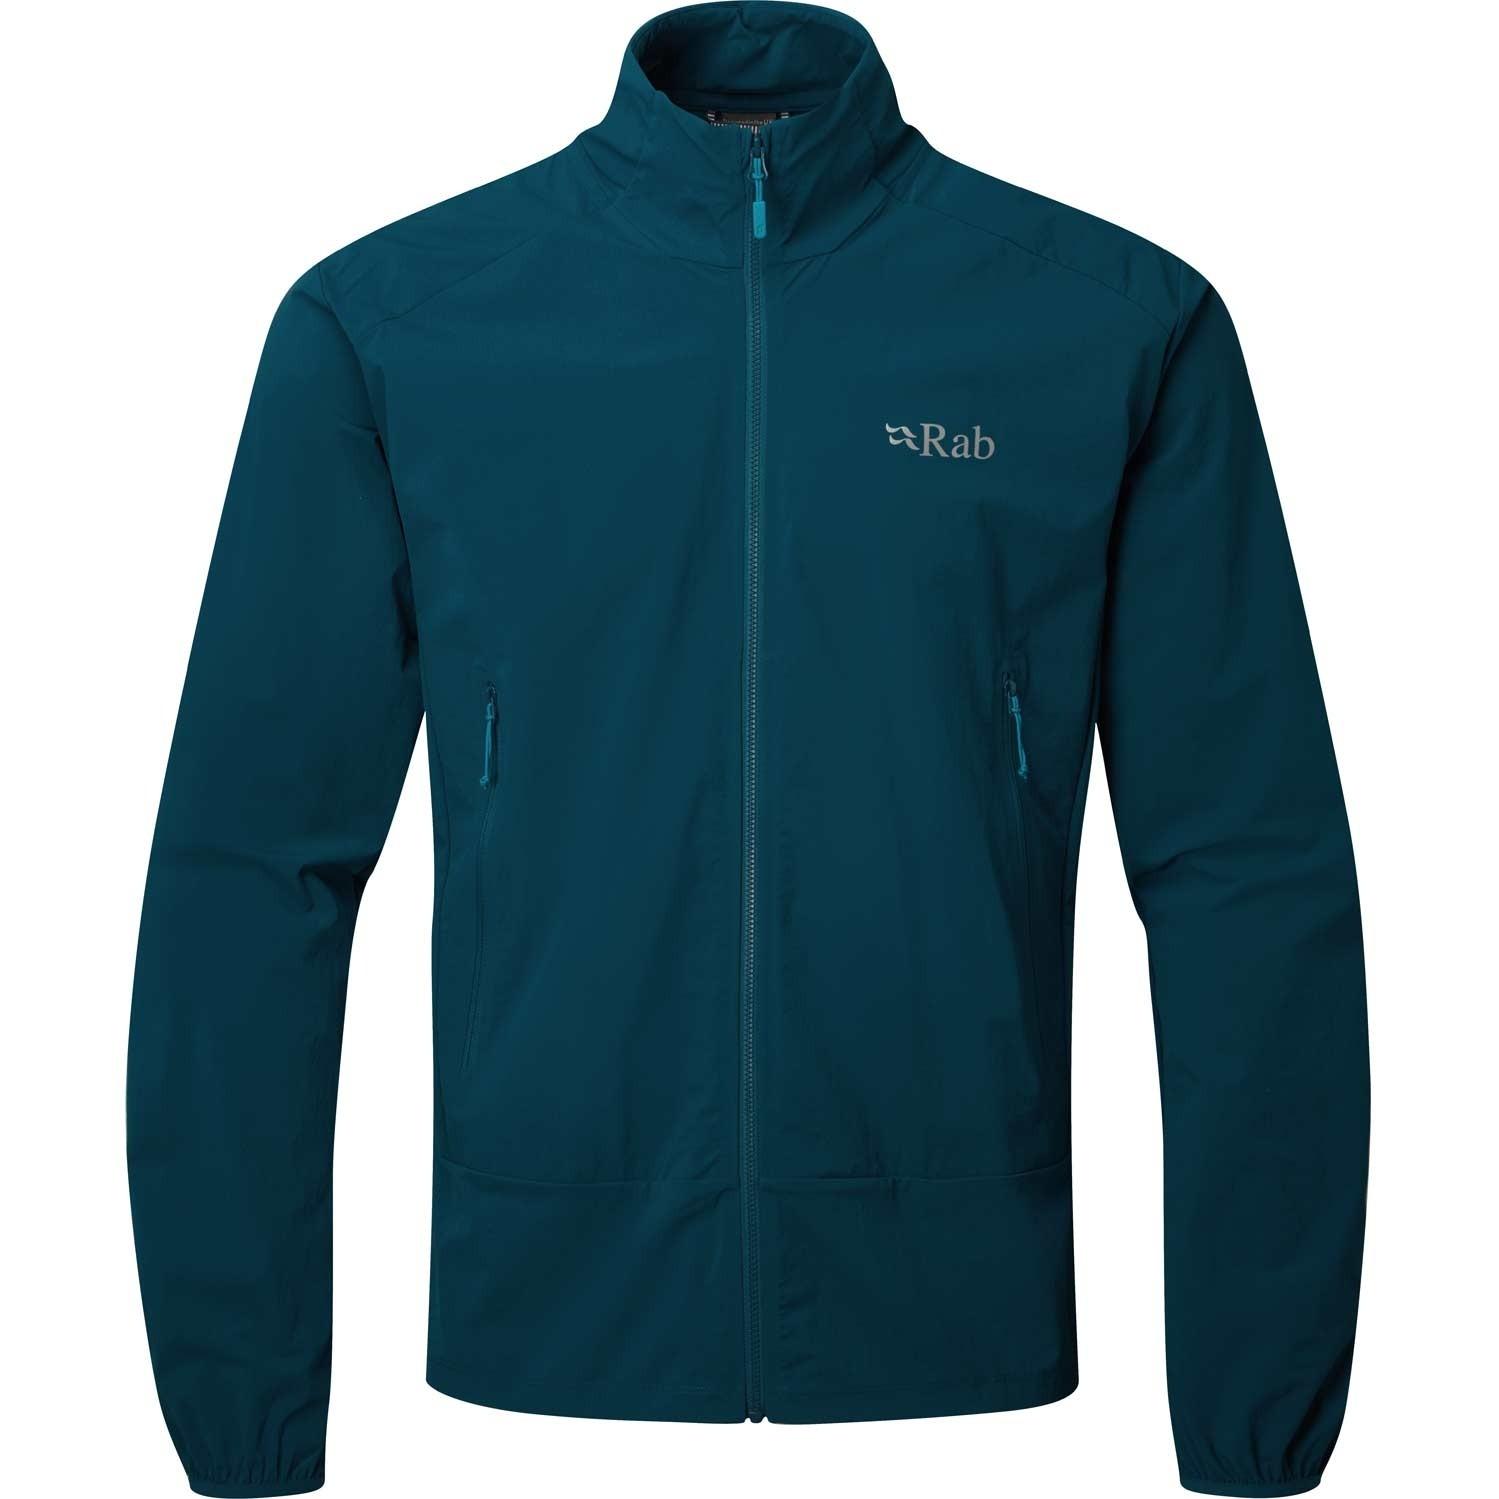 Rab Borealis Tour Men's Softshell Jacket - Ink